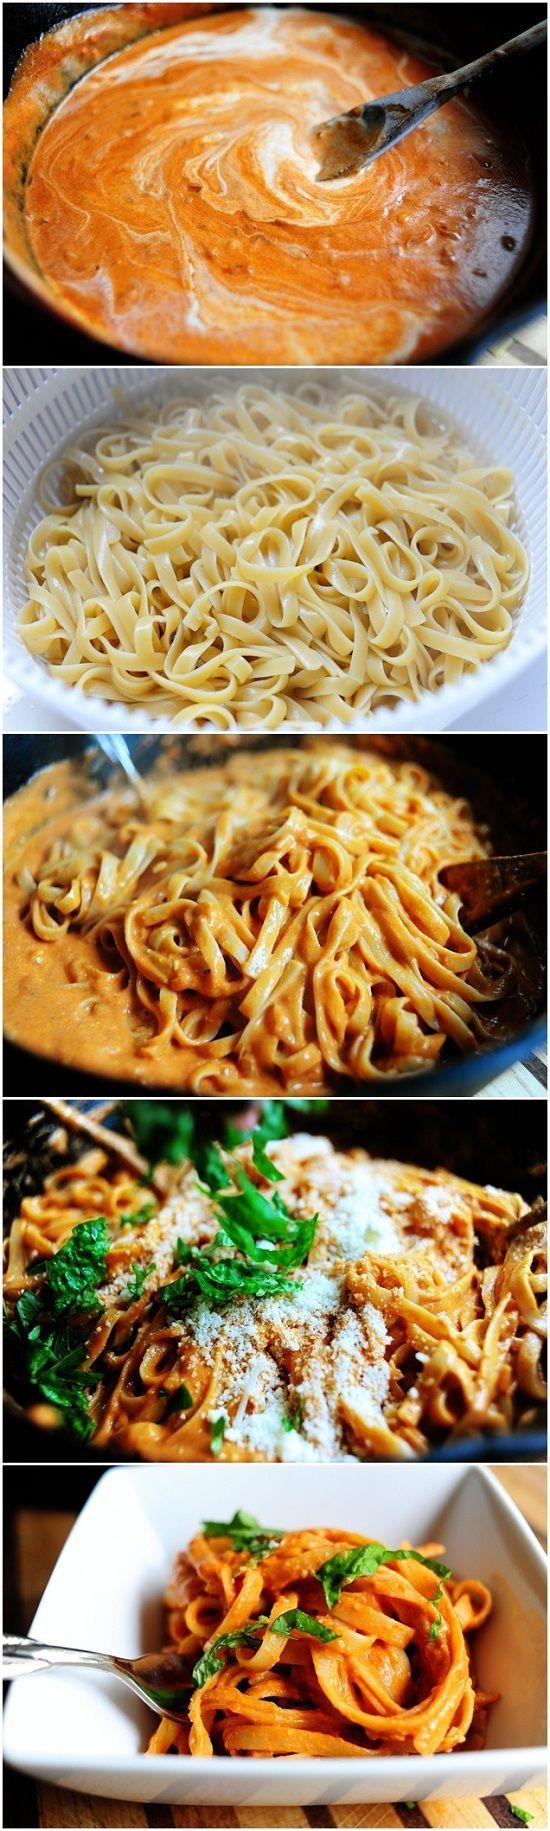 Pasta with Tomato Cream Sauce. | Favorite Recipes | Pinterest